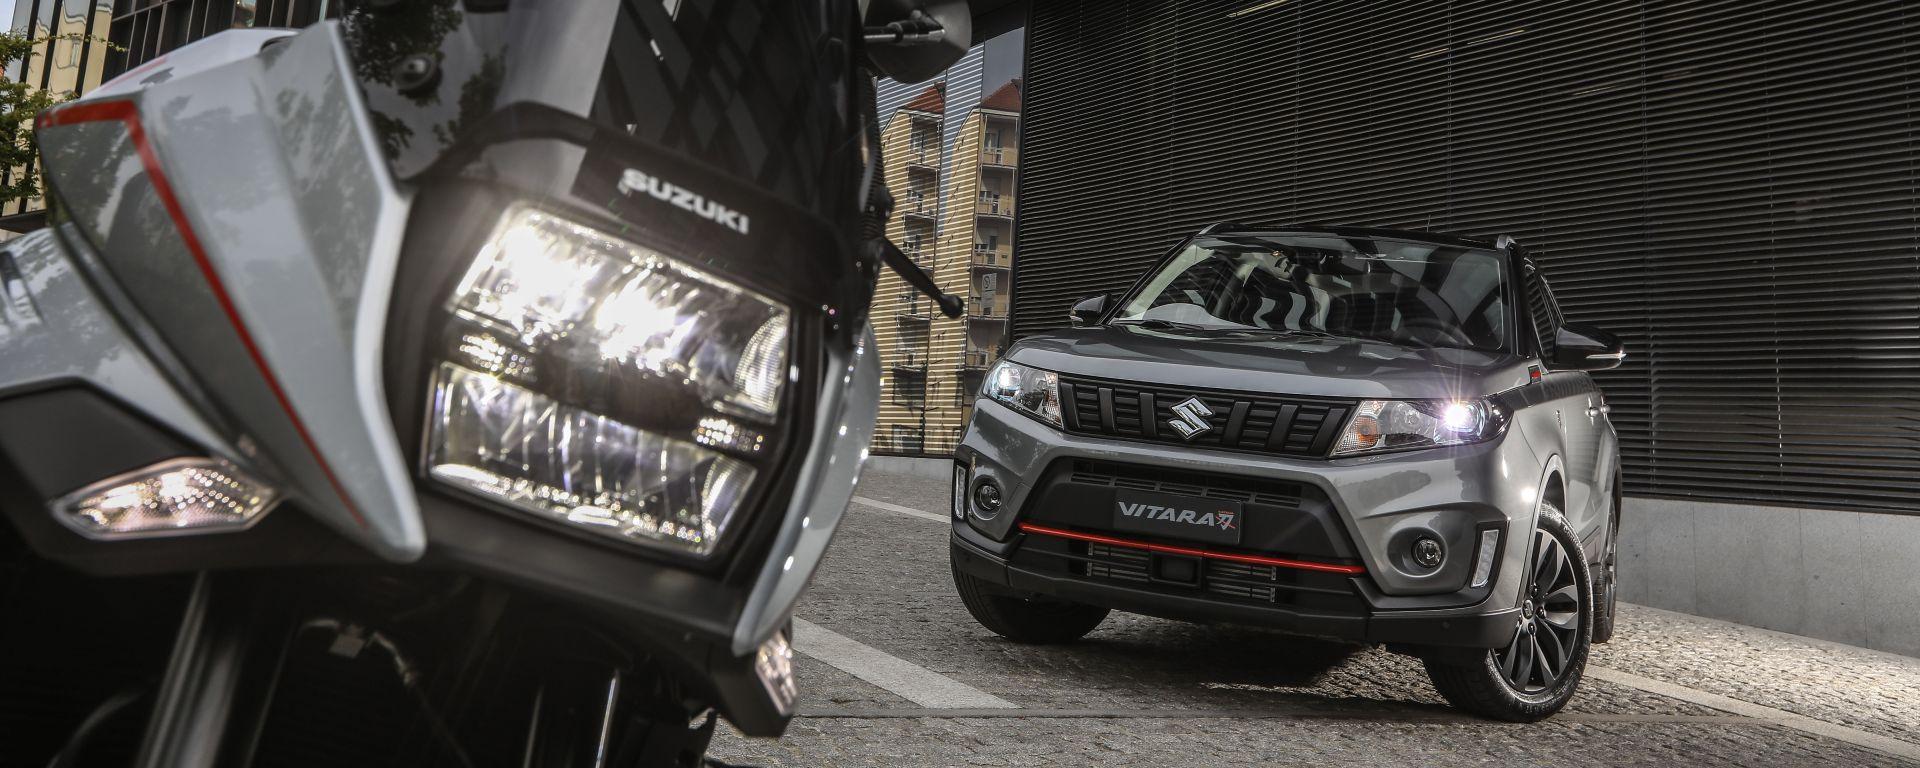 La Suzuki Katana con la Suzuki Vitara